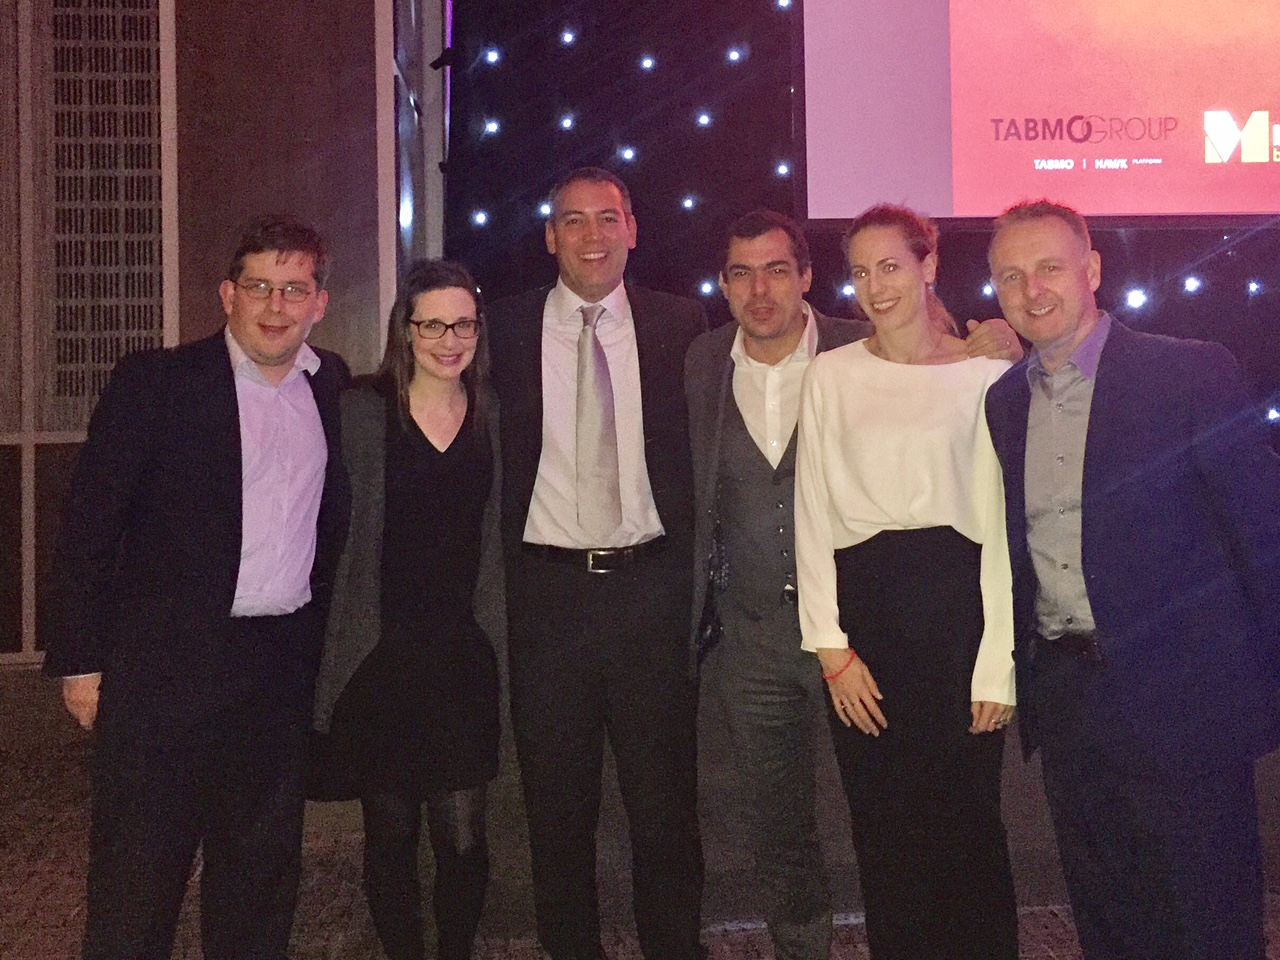 effective-mobile-marketing-award-london-november-2016